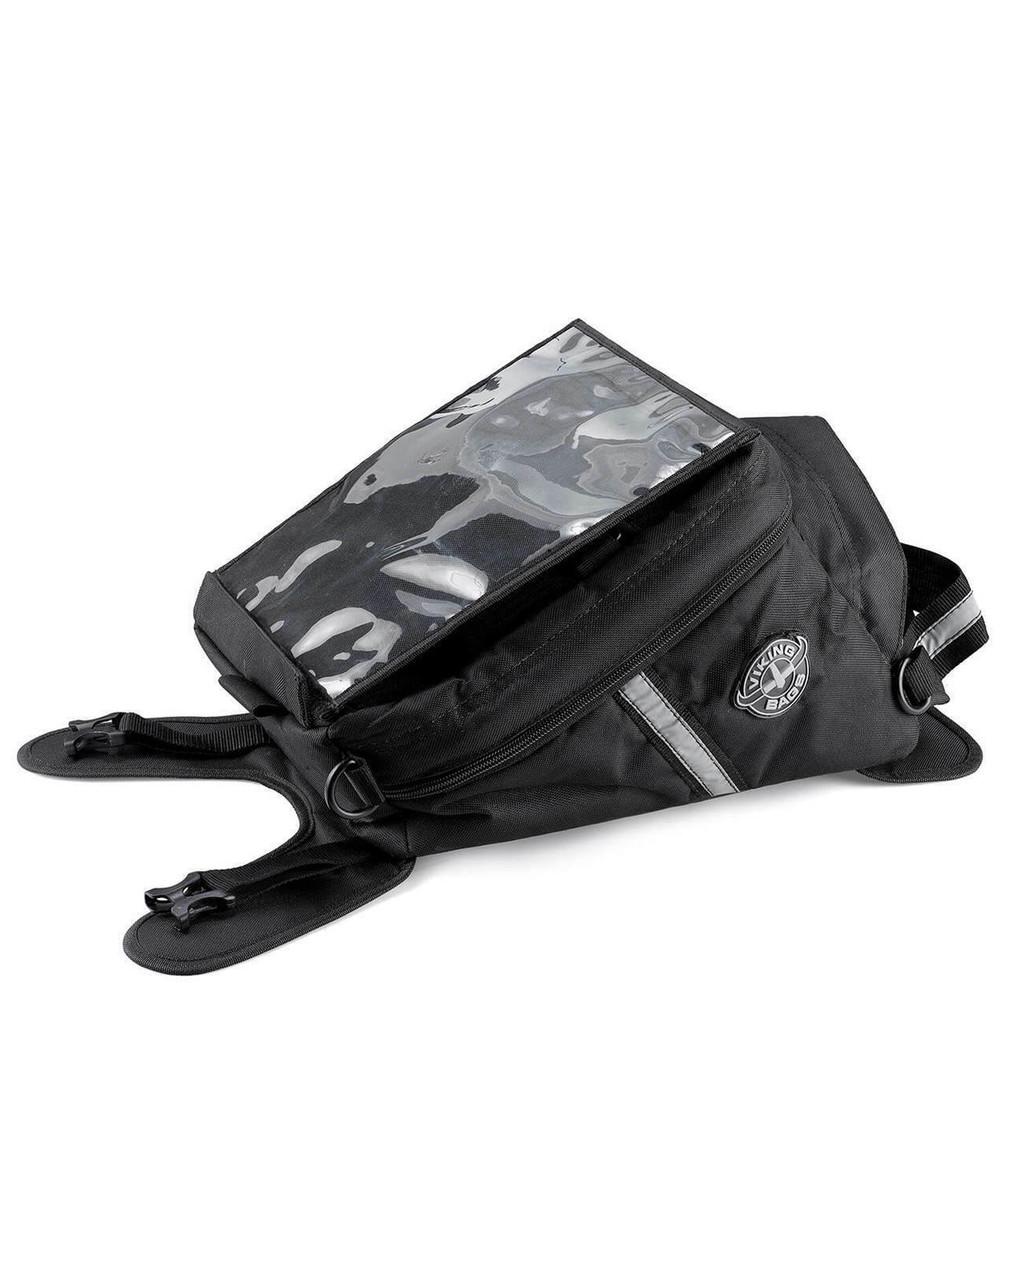 Viking Dirtman Medium Black Motorcycle Tank Bag For Harley Davidson Main Bag View